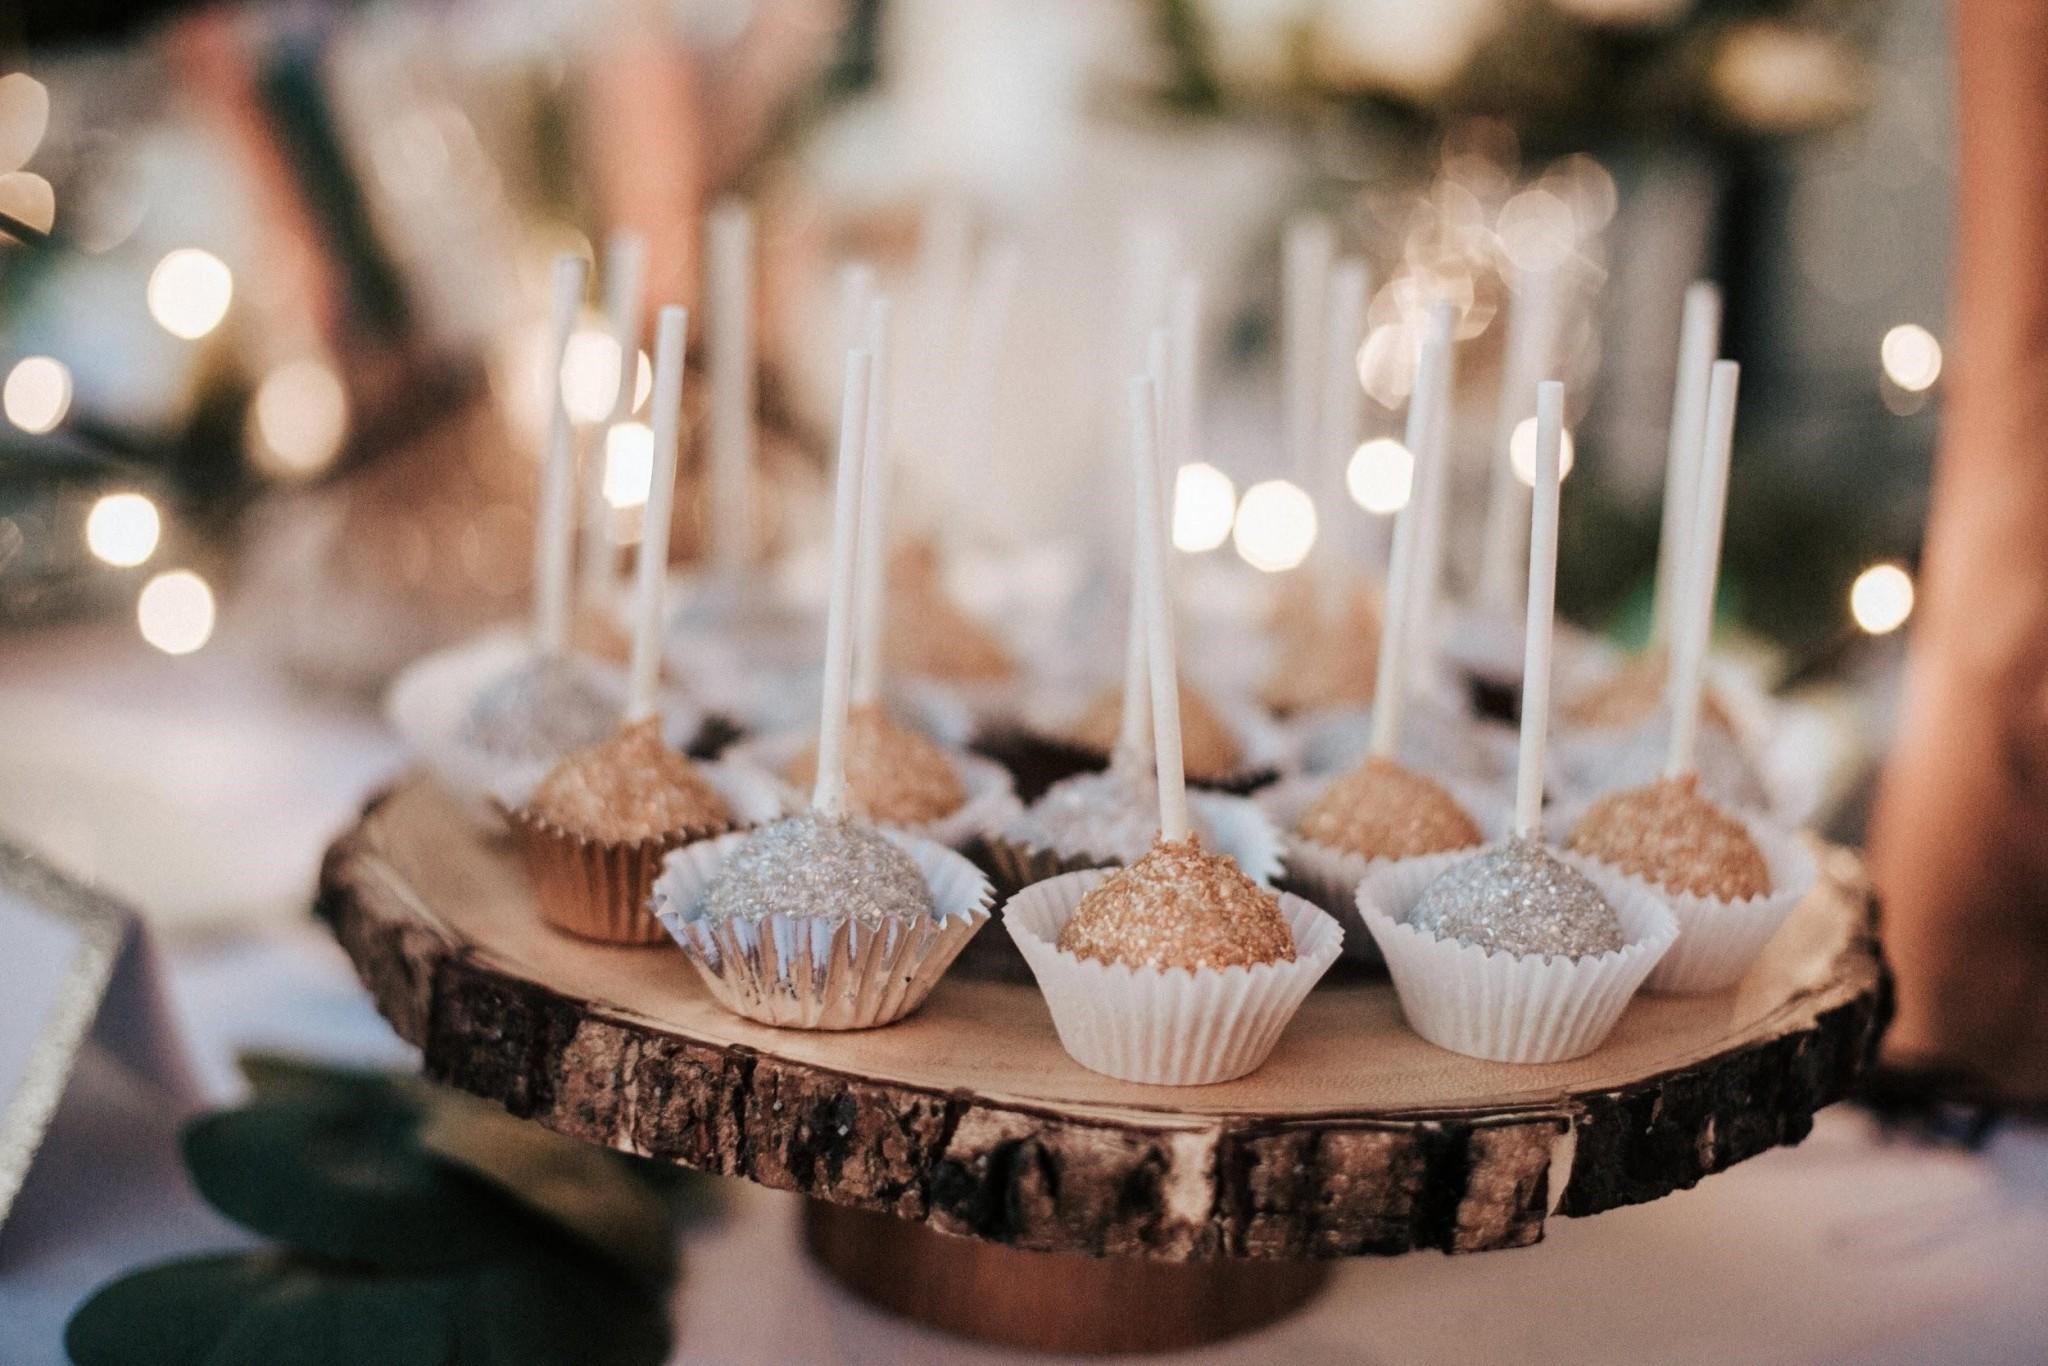 Wedding Cake Alternatives: Mini Desserts | Indian Ridge, Hudson Valley Wedding Venue | www.IndianRidgePreserve.com